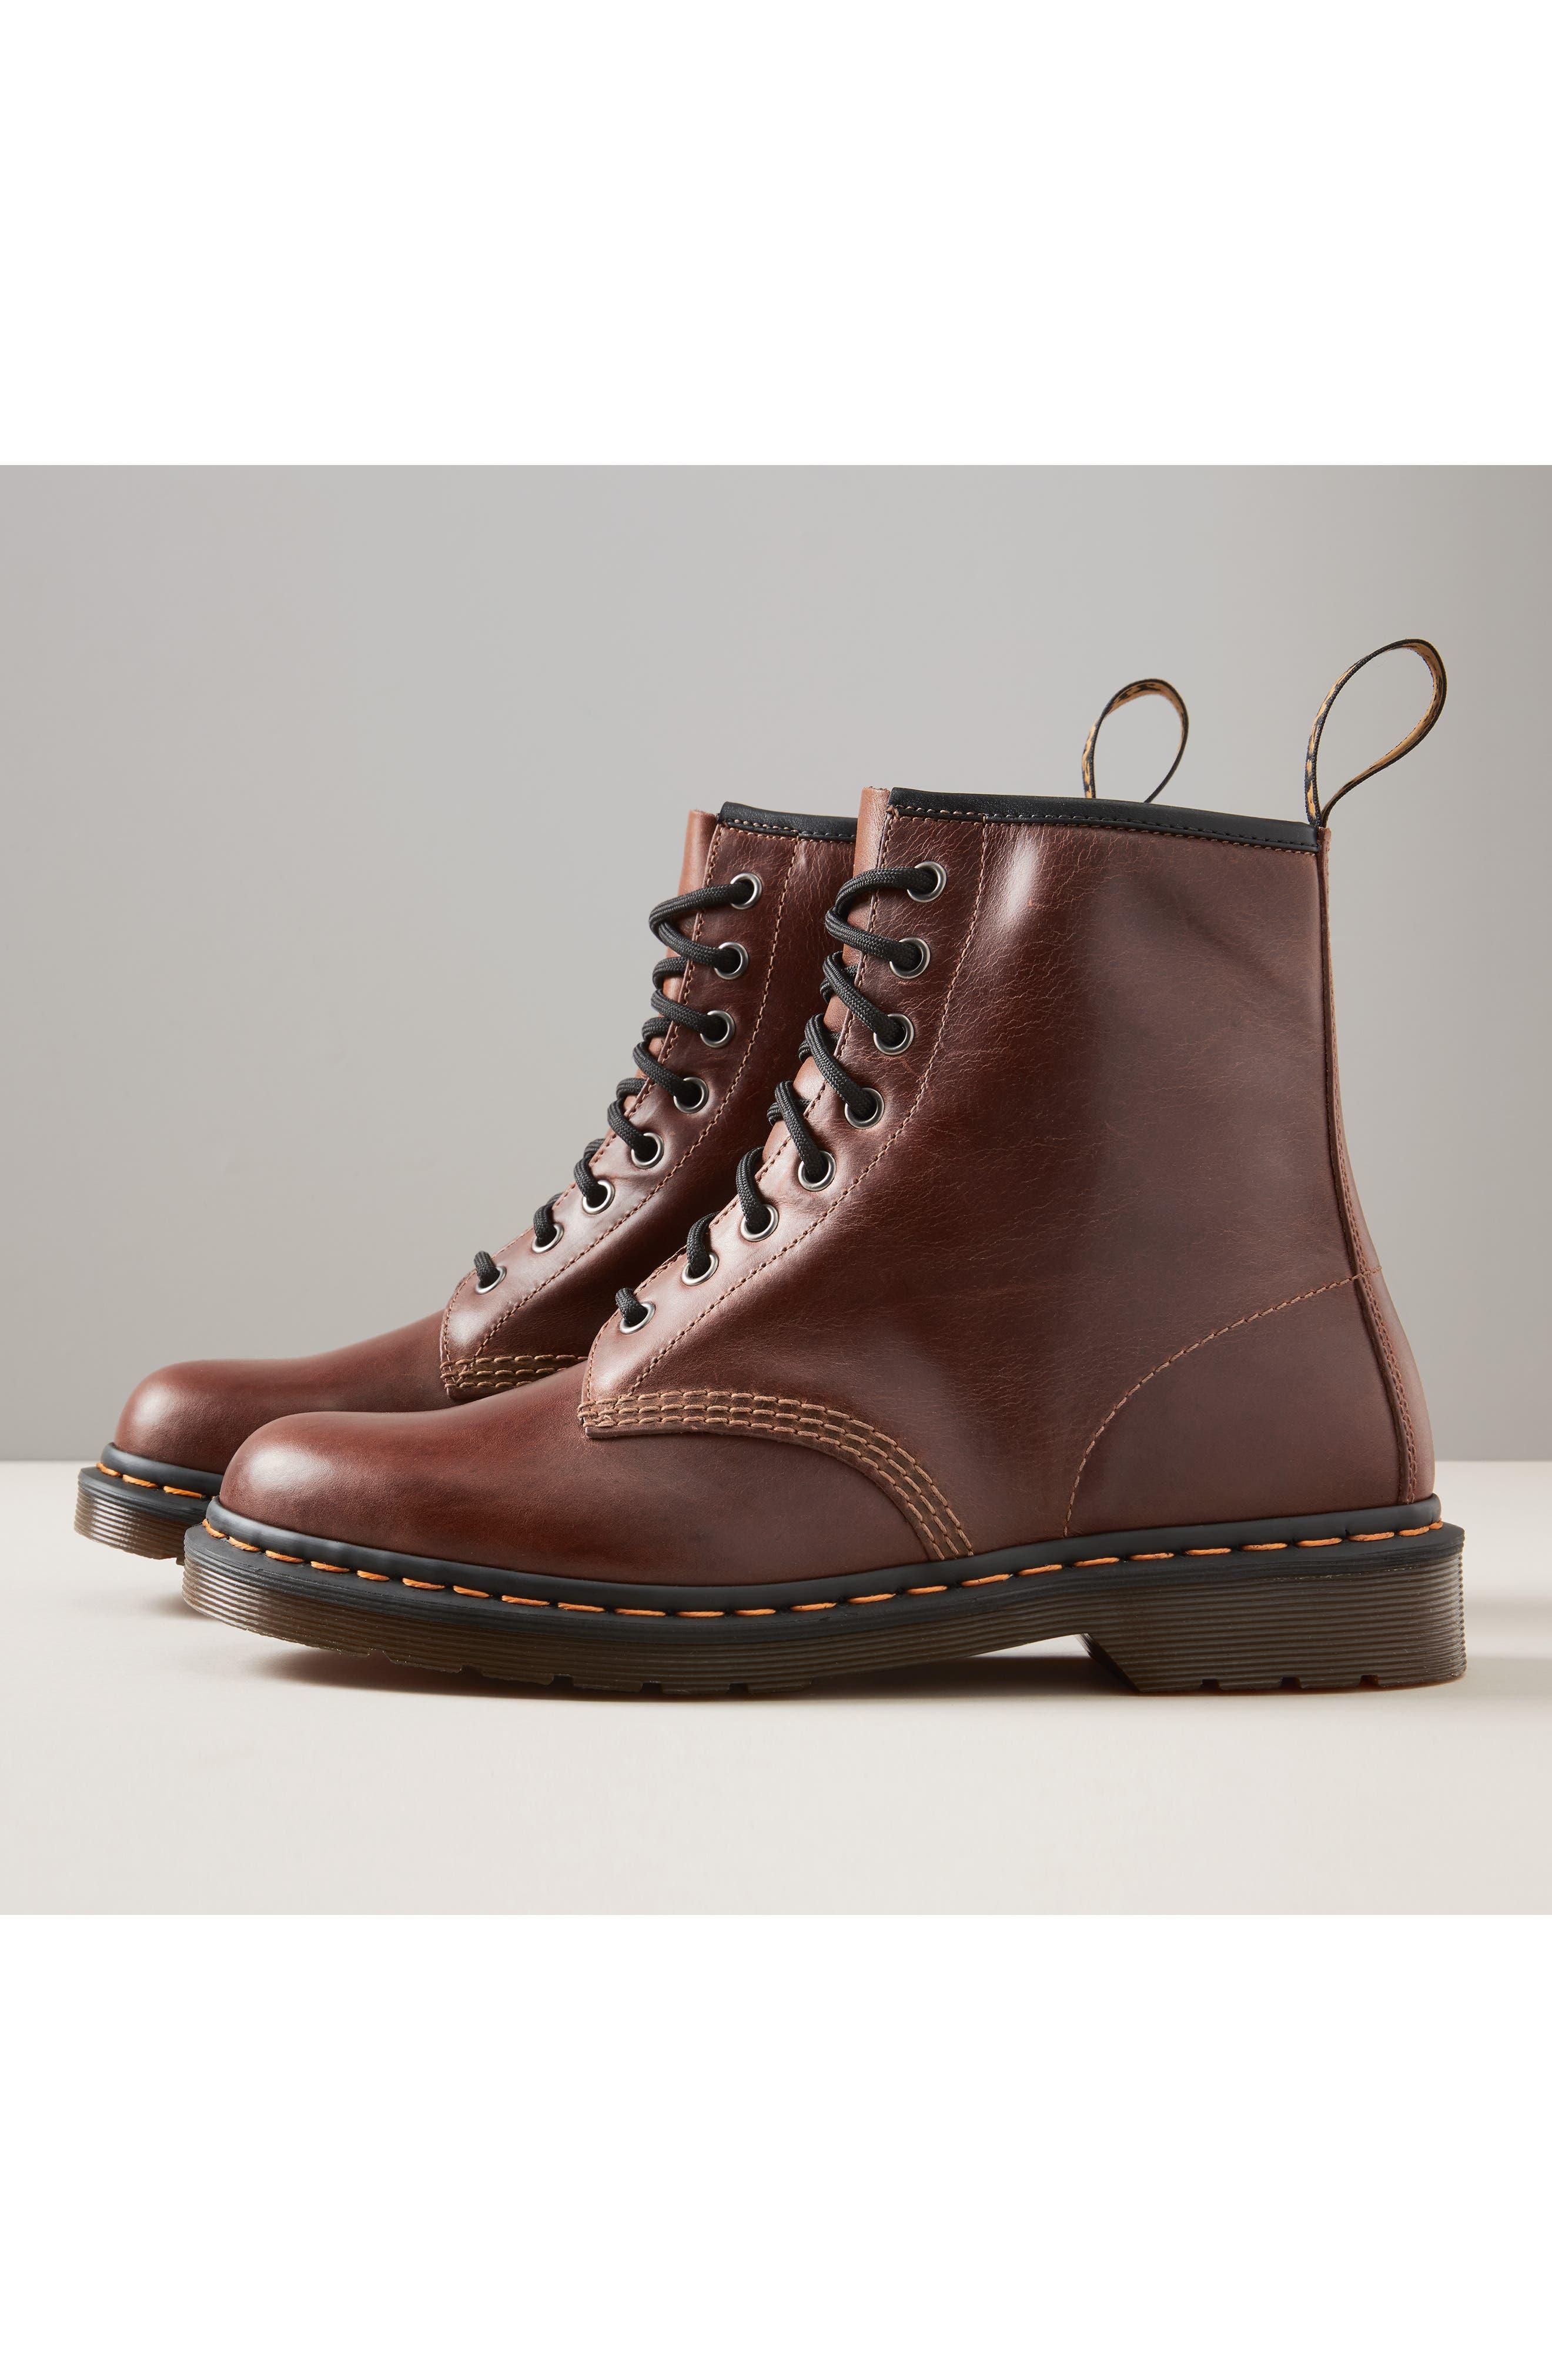 1460 8-Eye Boot,                             Alternate thumbnail 2, color,                             243